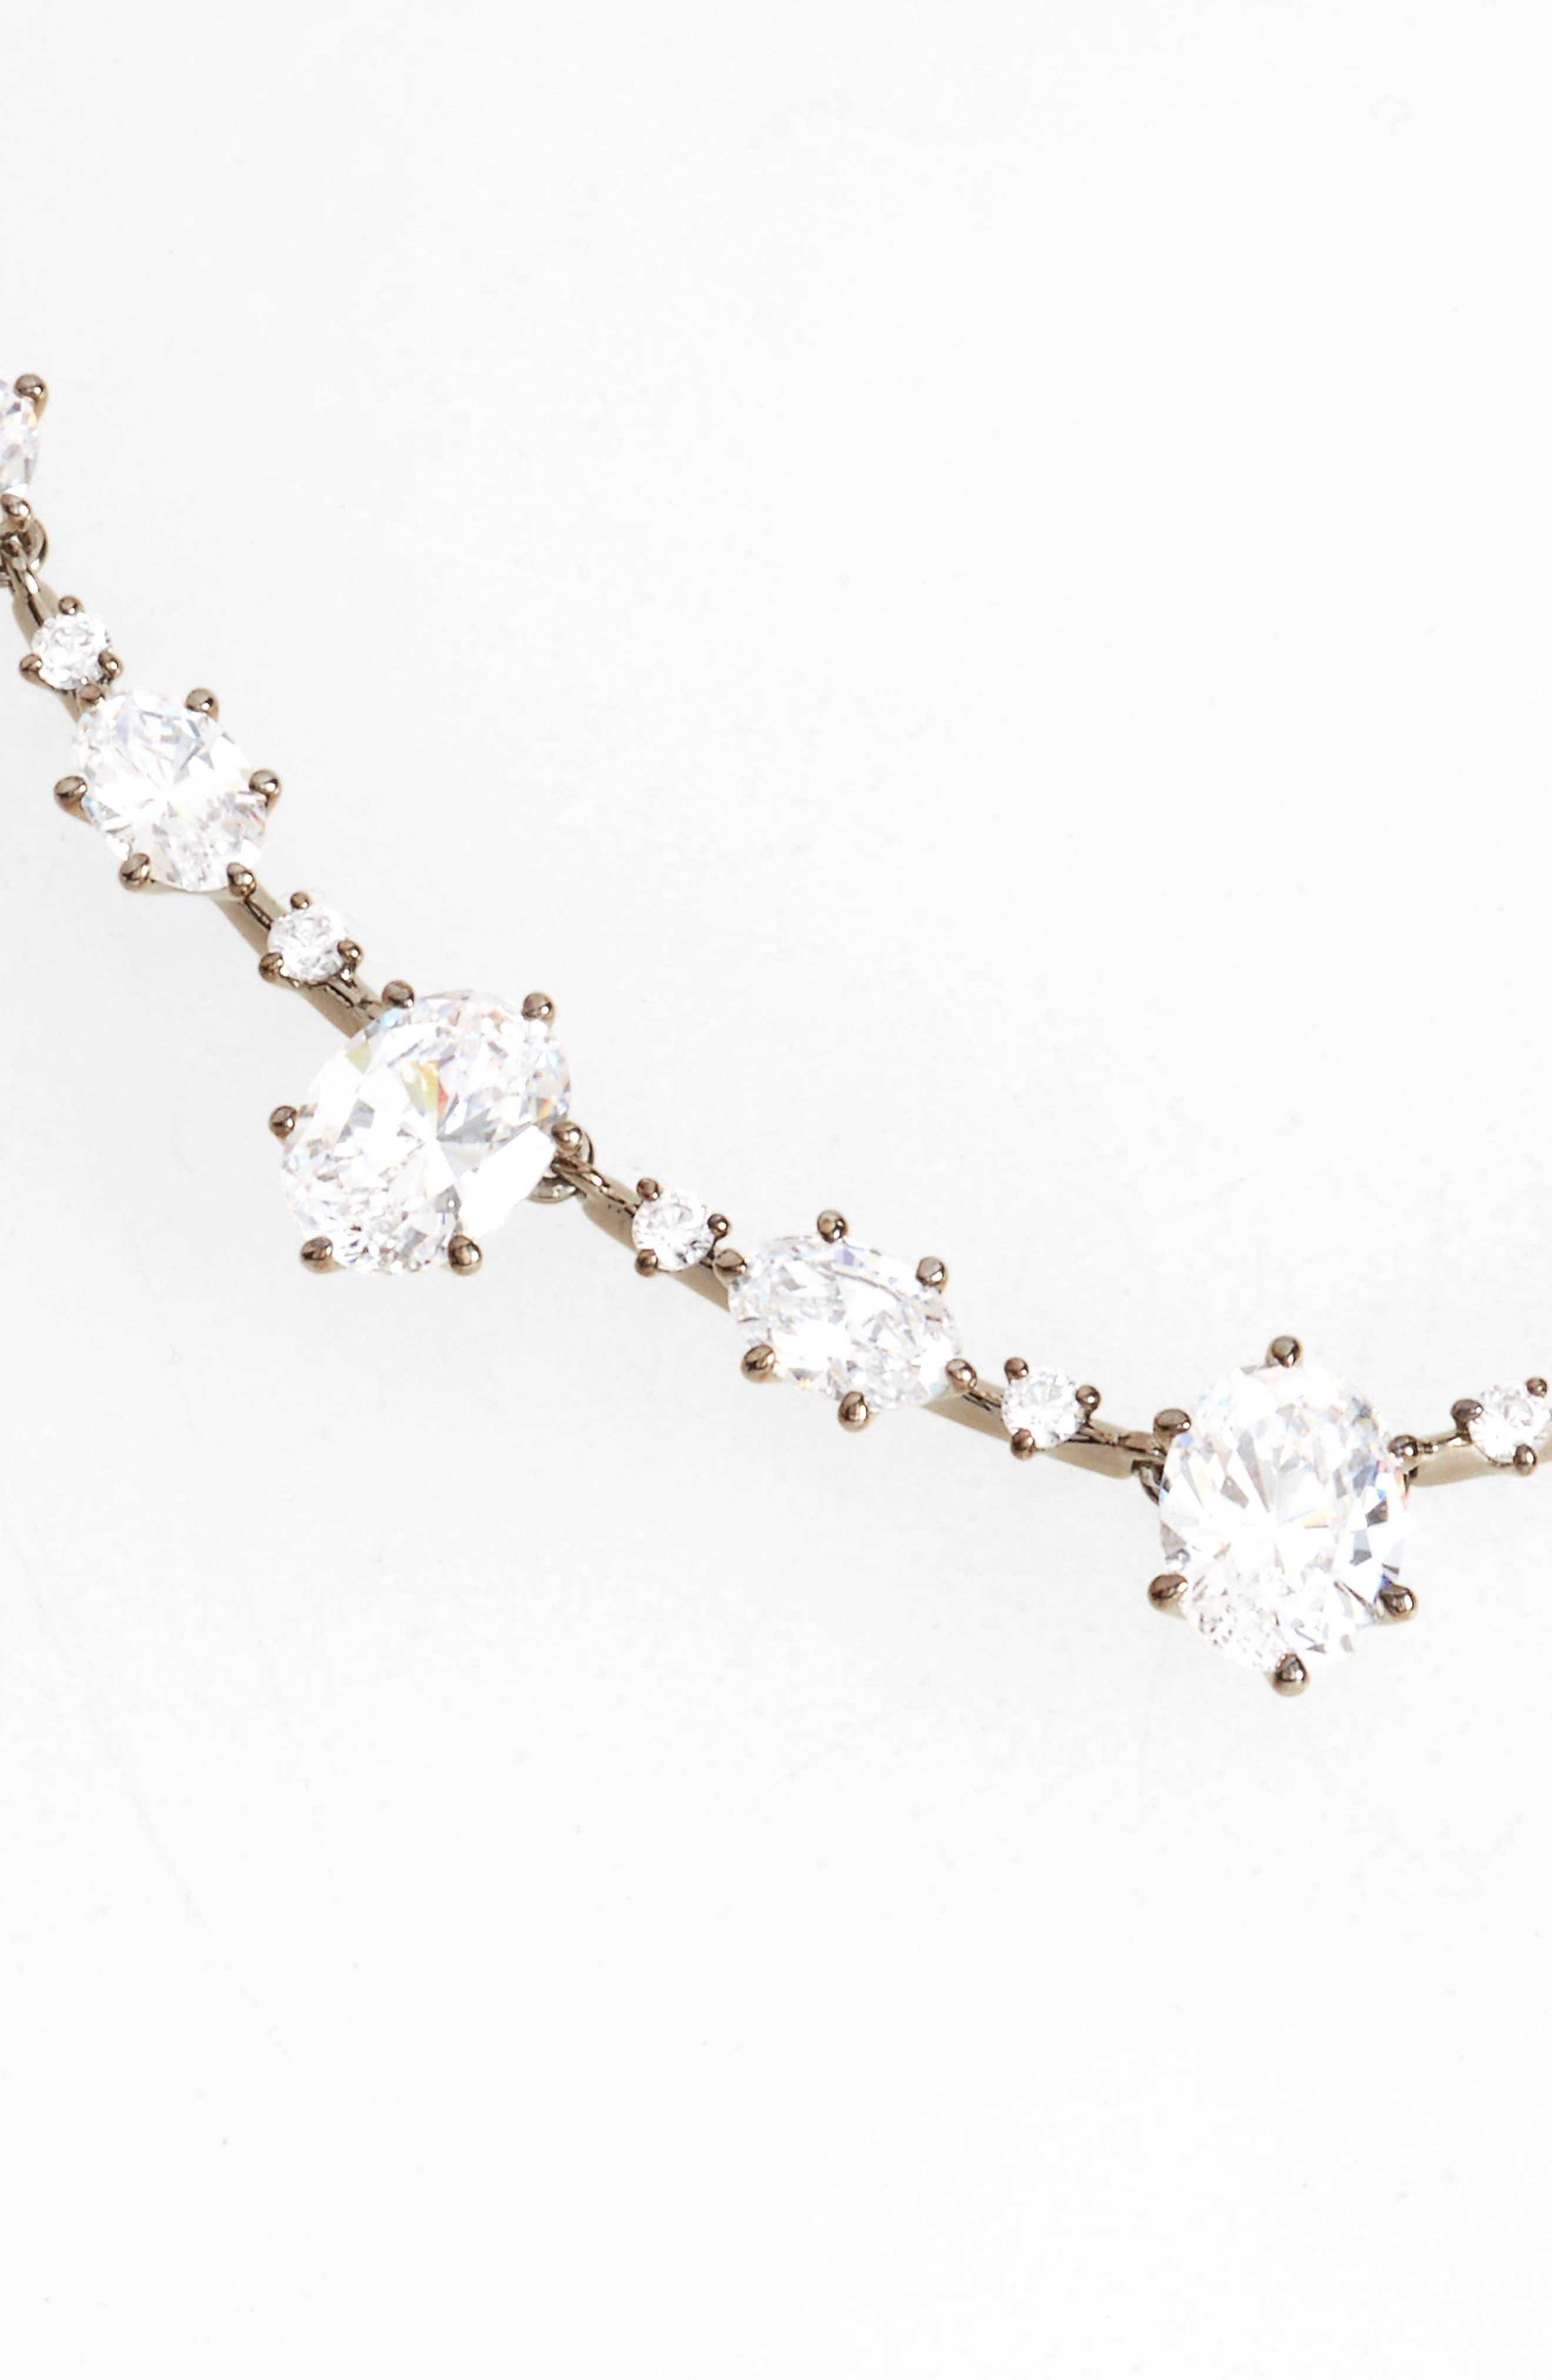 Royale Cubic Zirconia Collar Necklace,                             Main thumbnail 1, color,                             001